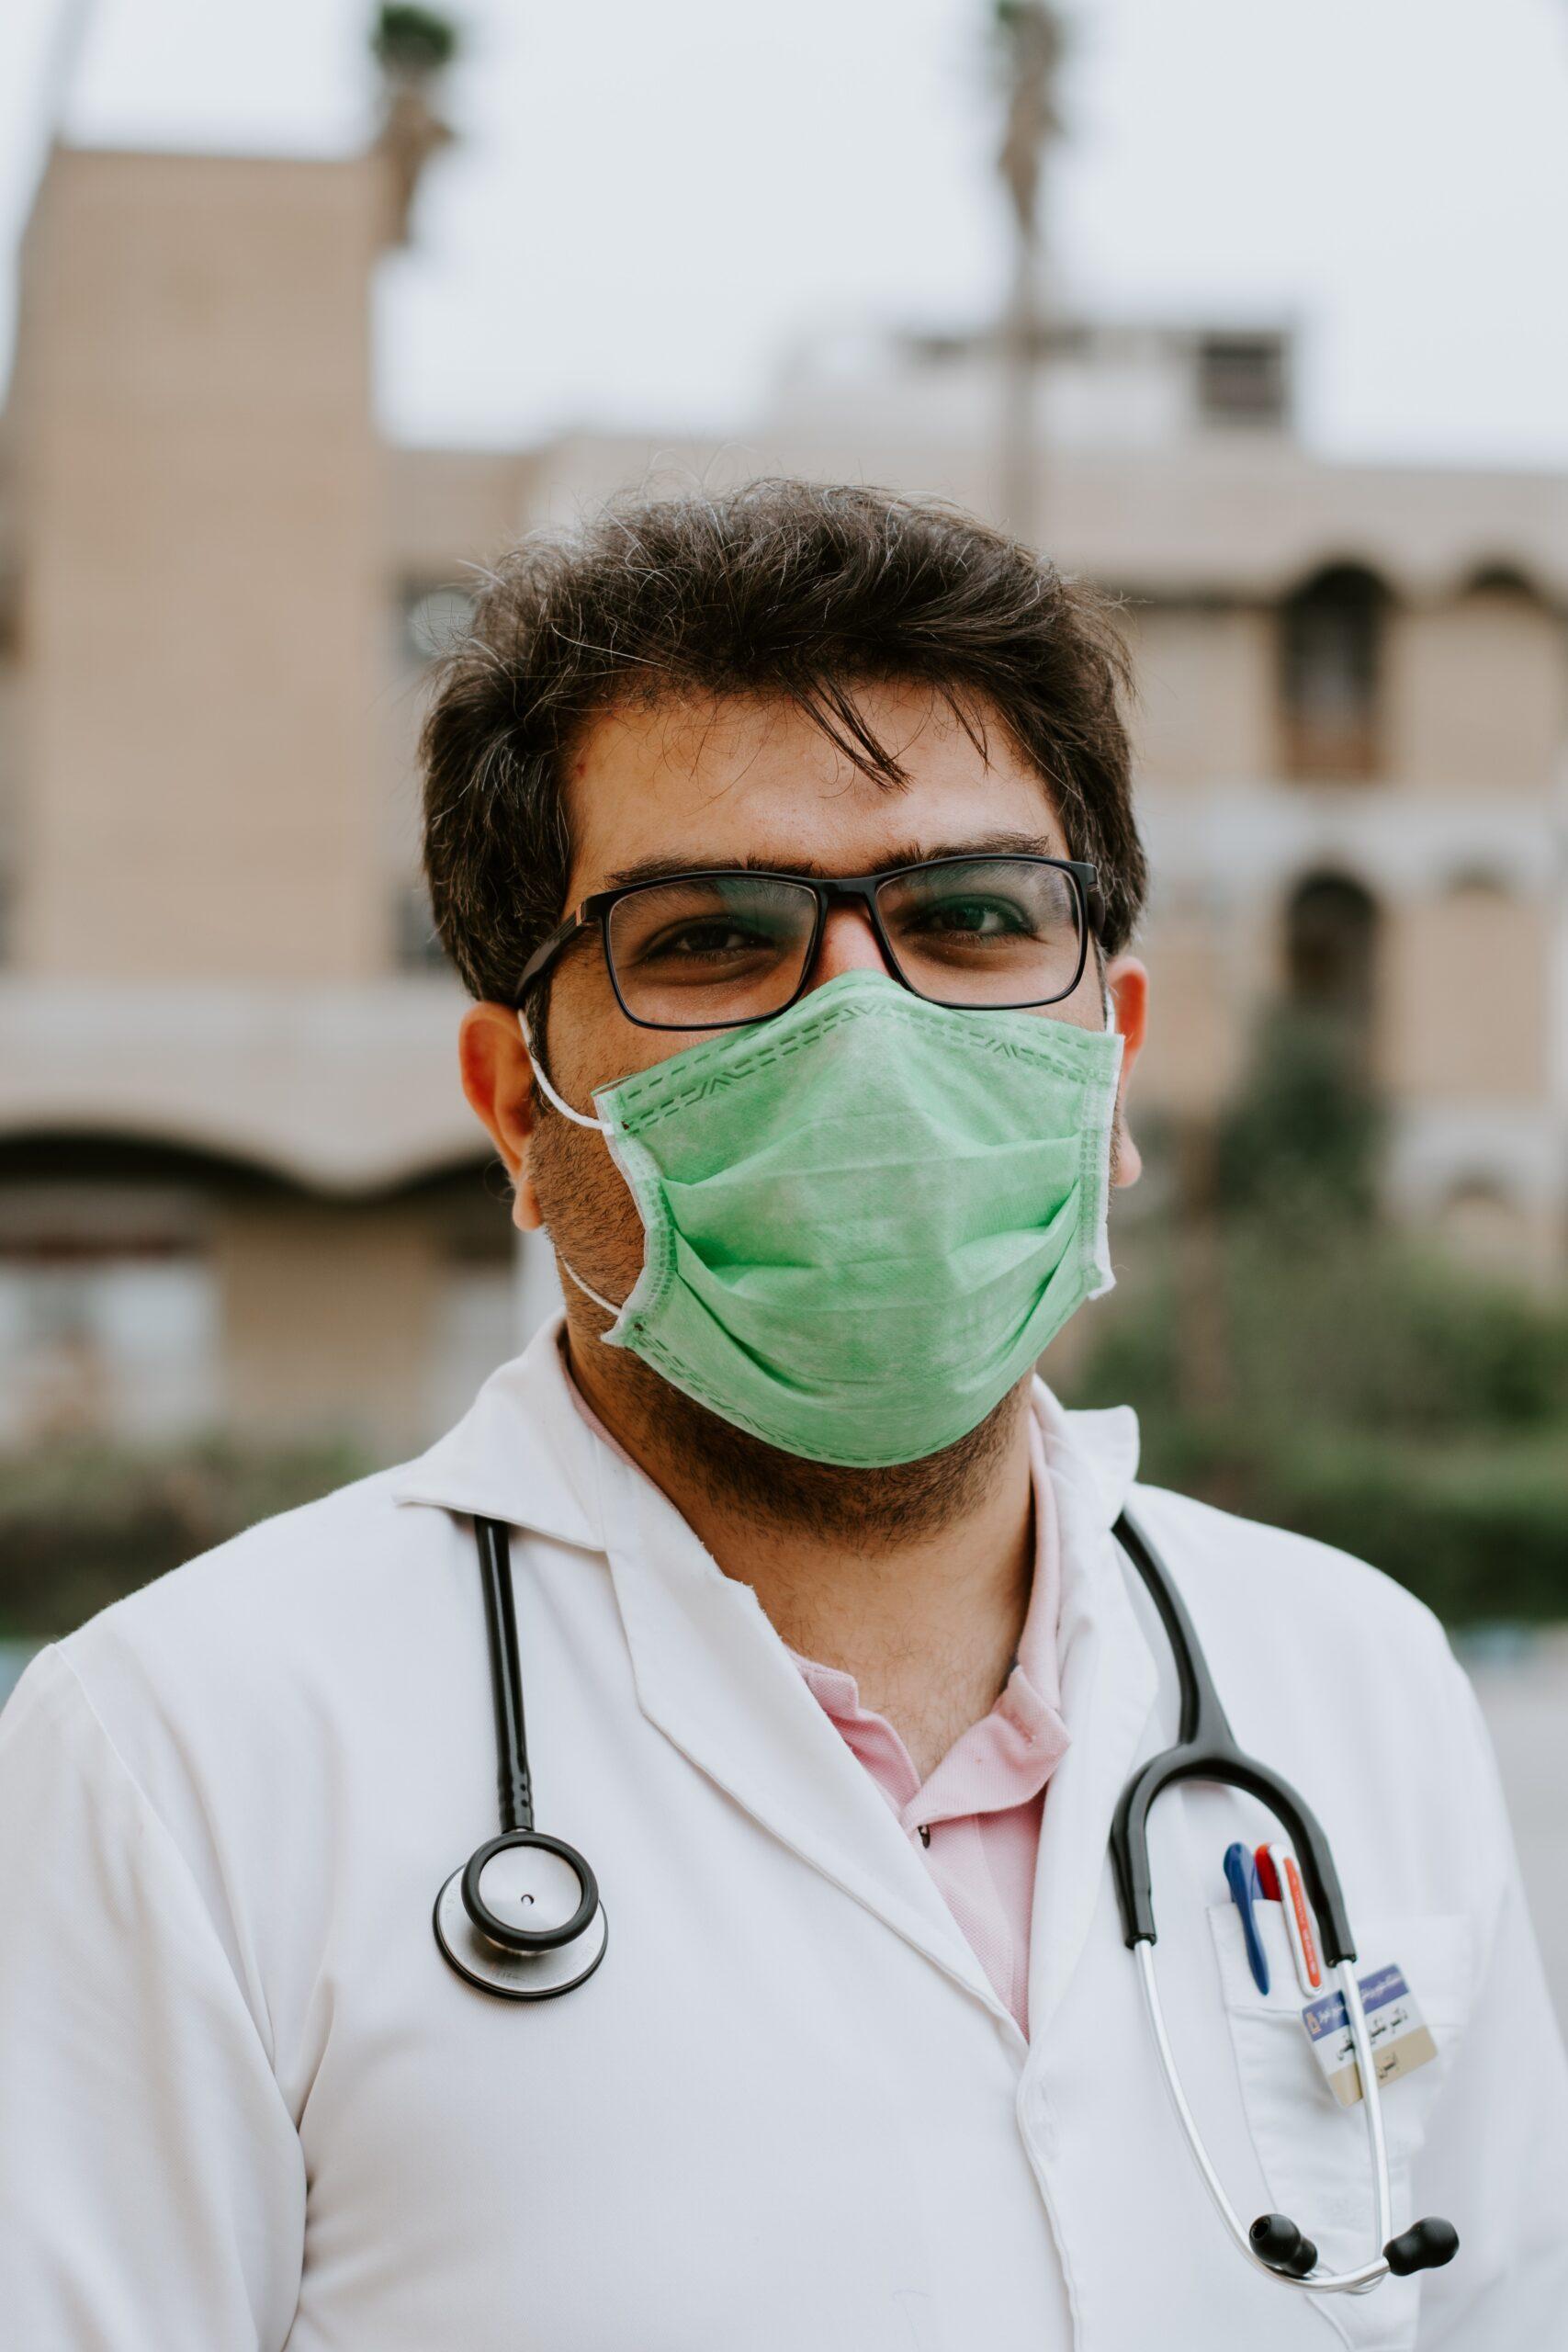 Zdravstveni sustav na pragu preopterećenja